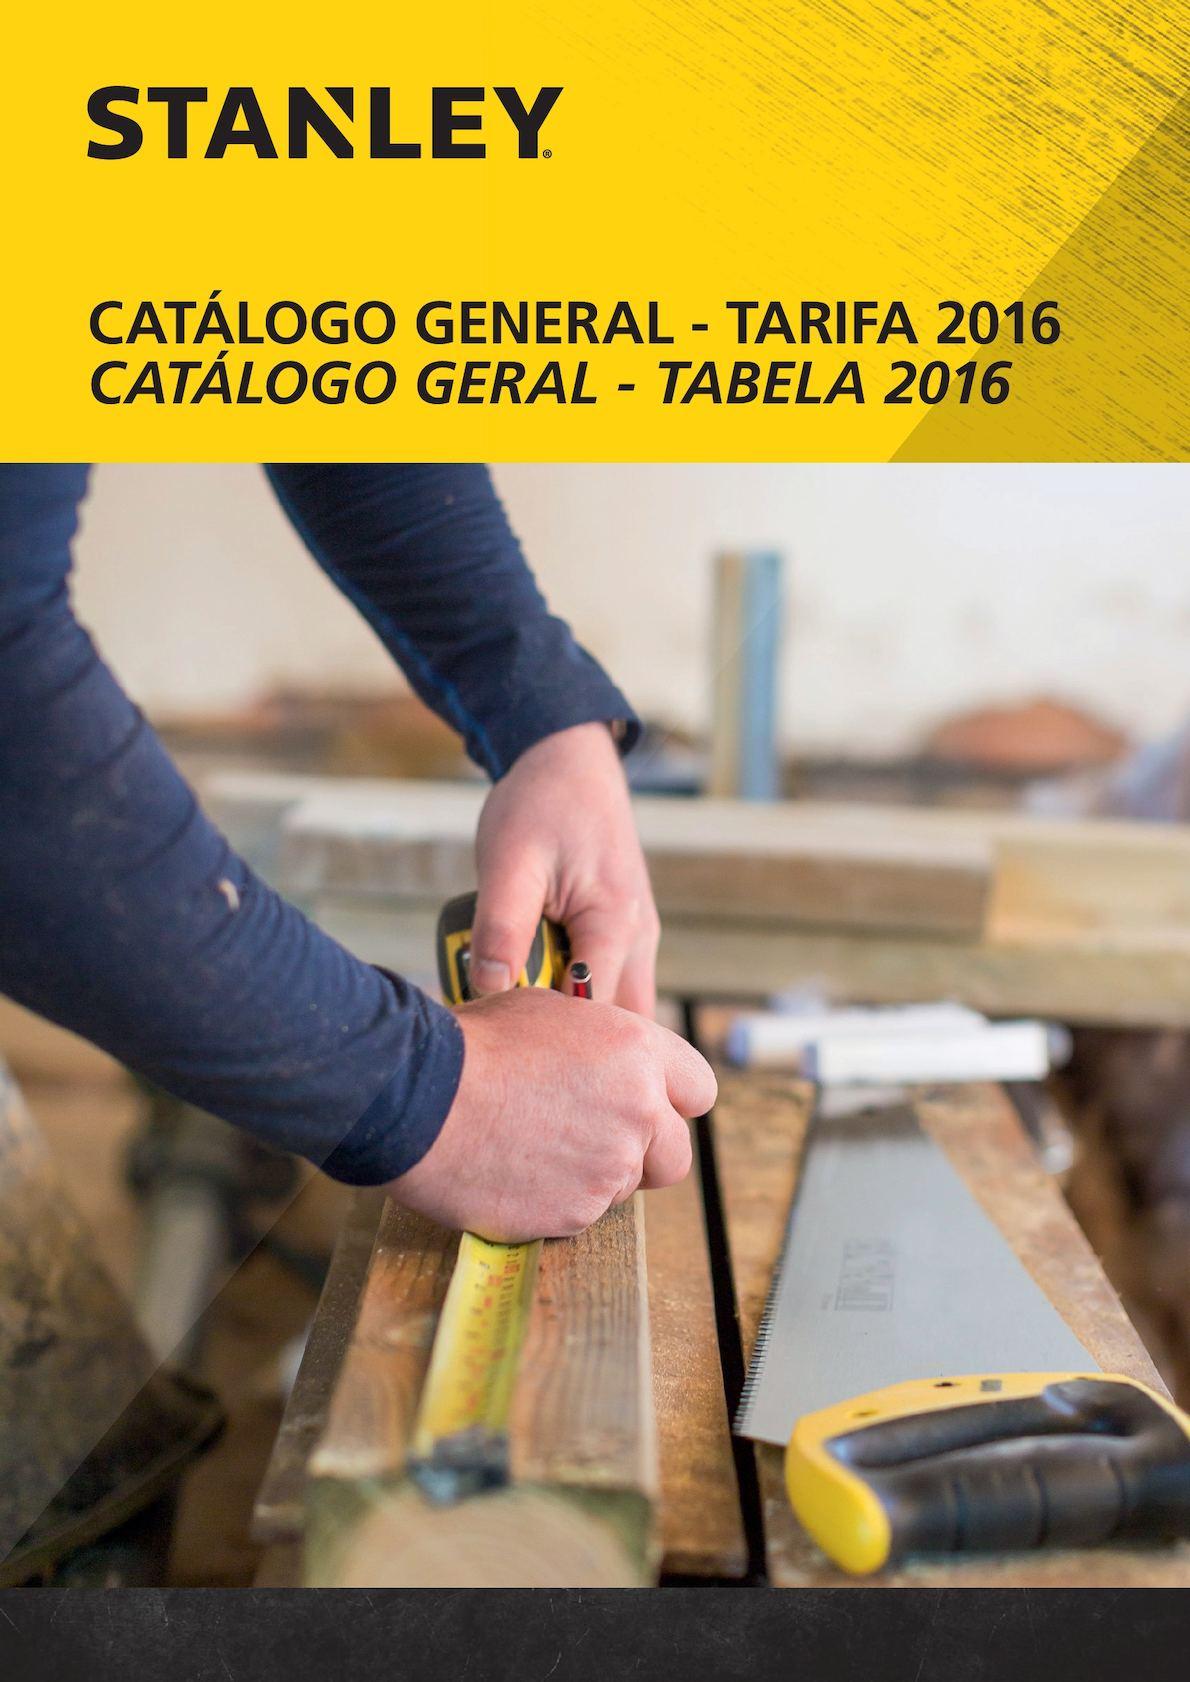 Stanley Catalogo Tarifa General 2016